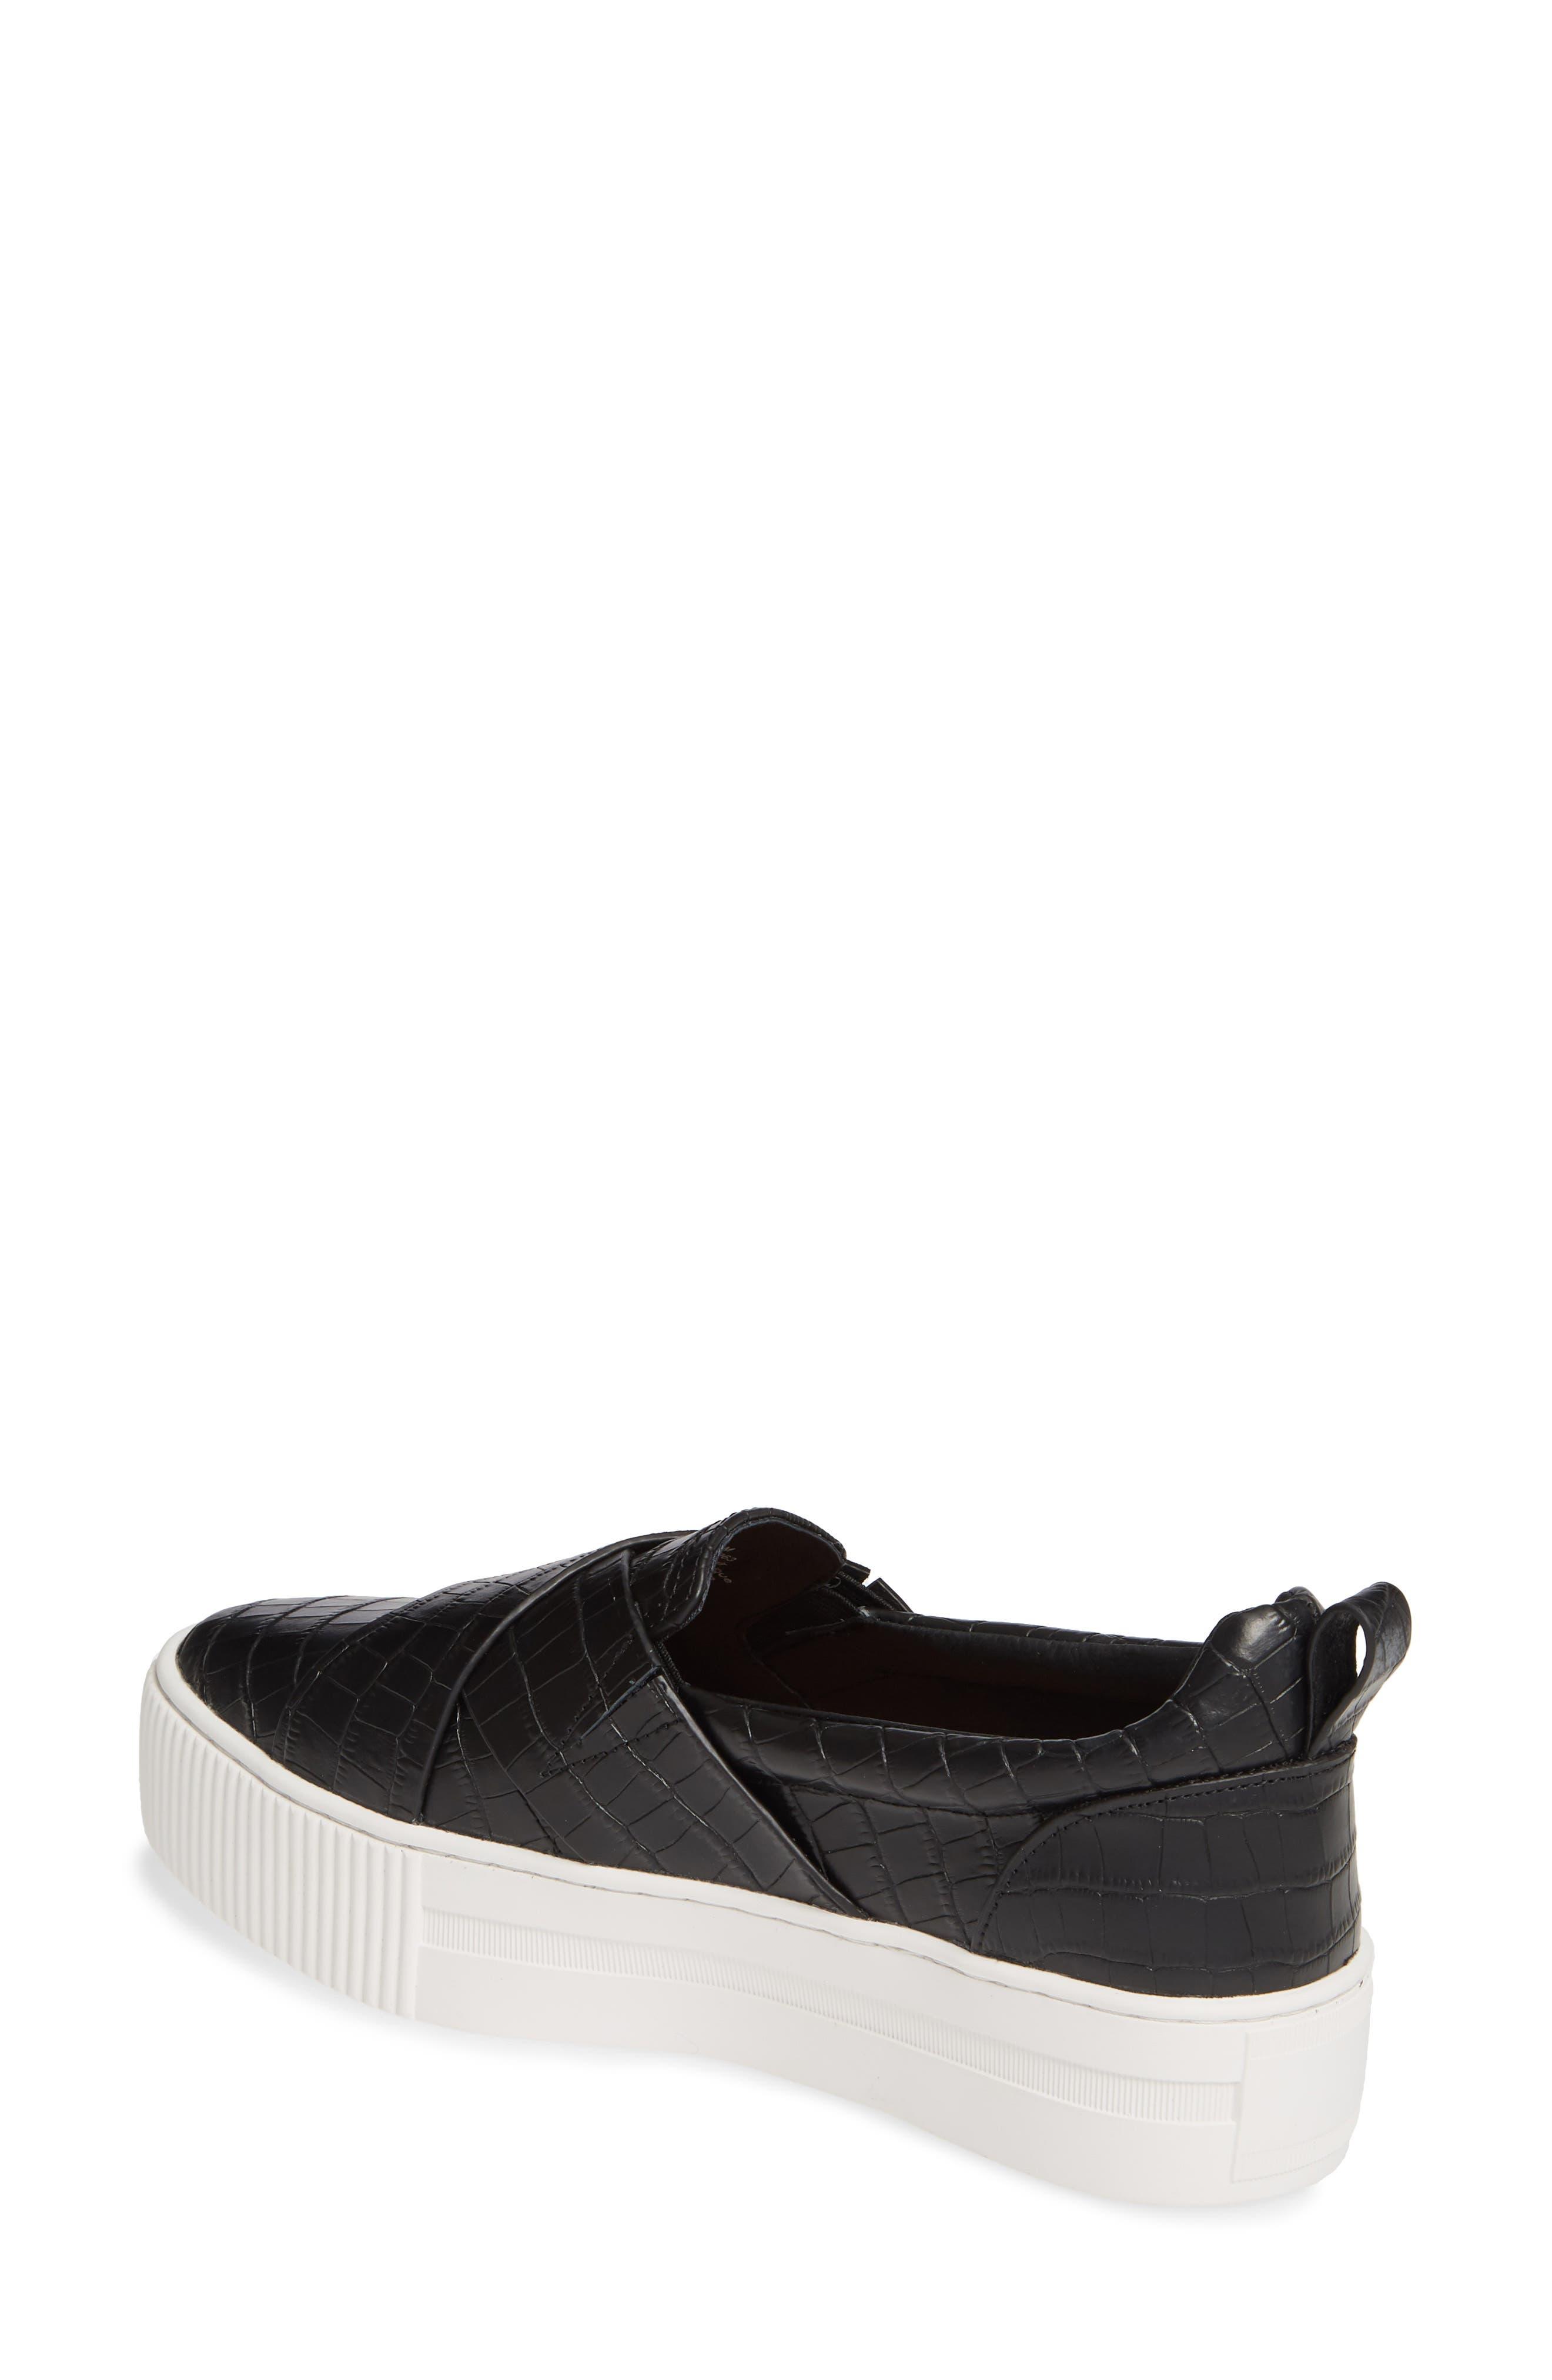 ,                             Blakely Slip-On Platform Sneaker,                             Alternate thumbnail 2, color,                             BLACK CROCO PRINTED LEATHER